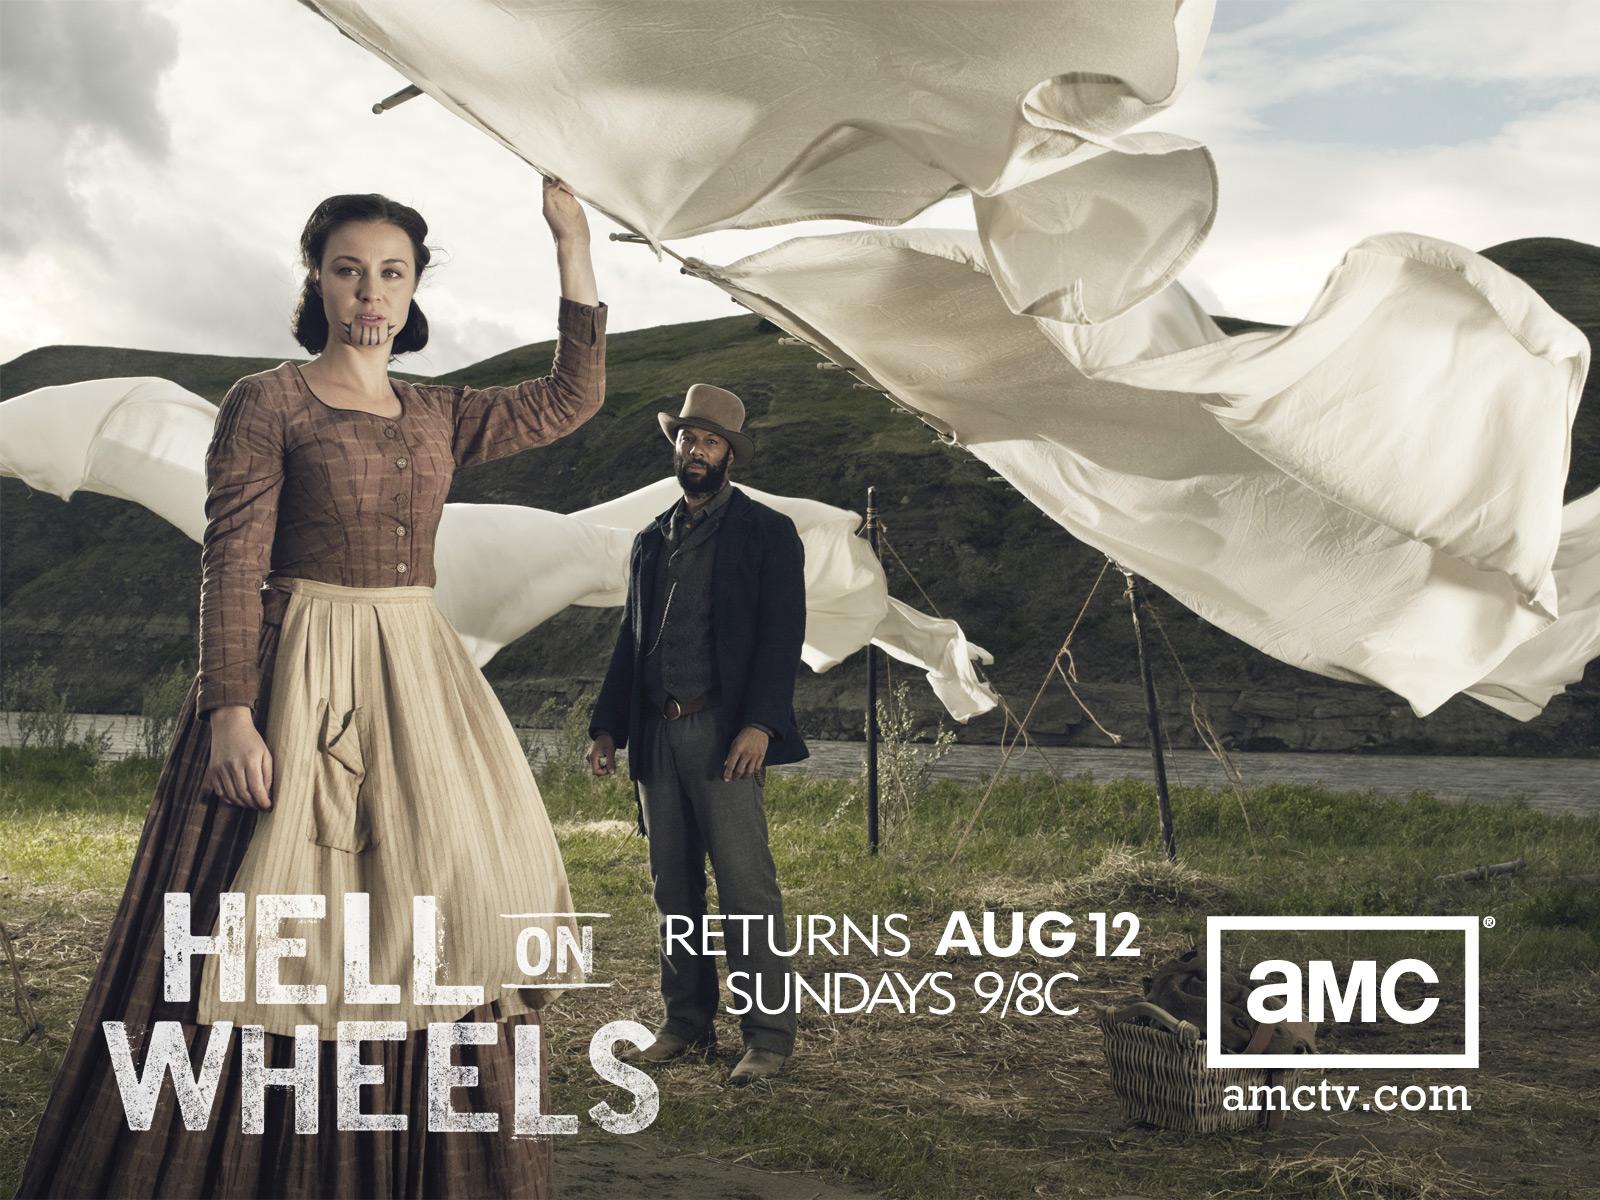 Hell-on-Wheels-hell-on-wheels-31741451-1600-1200.jpg